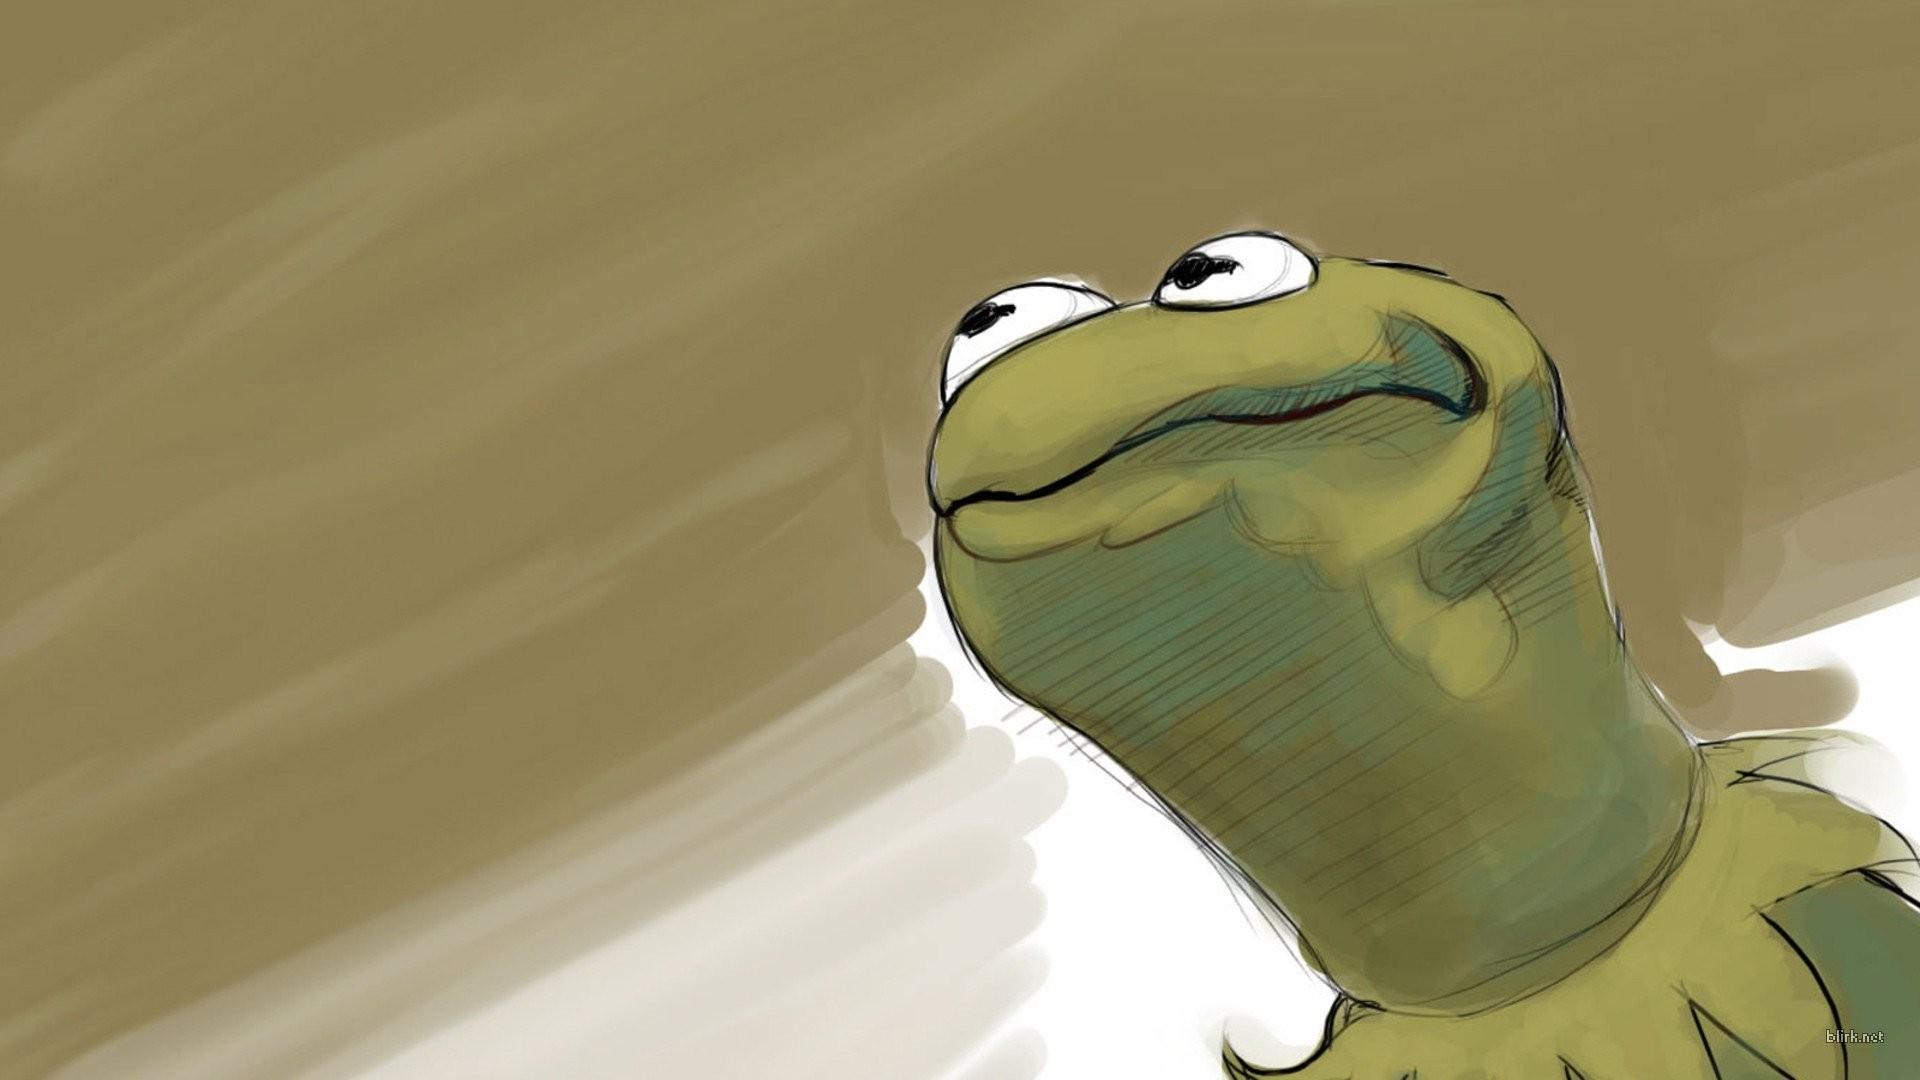 Hearts Kermit The Frog Download Wallpaper